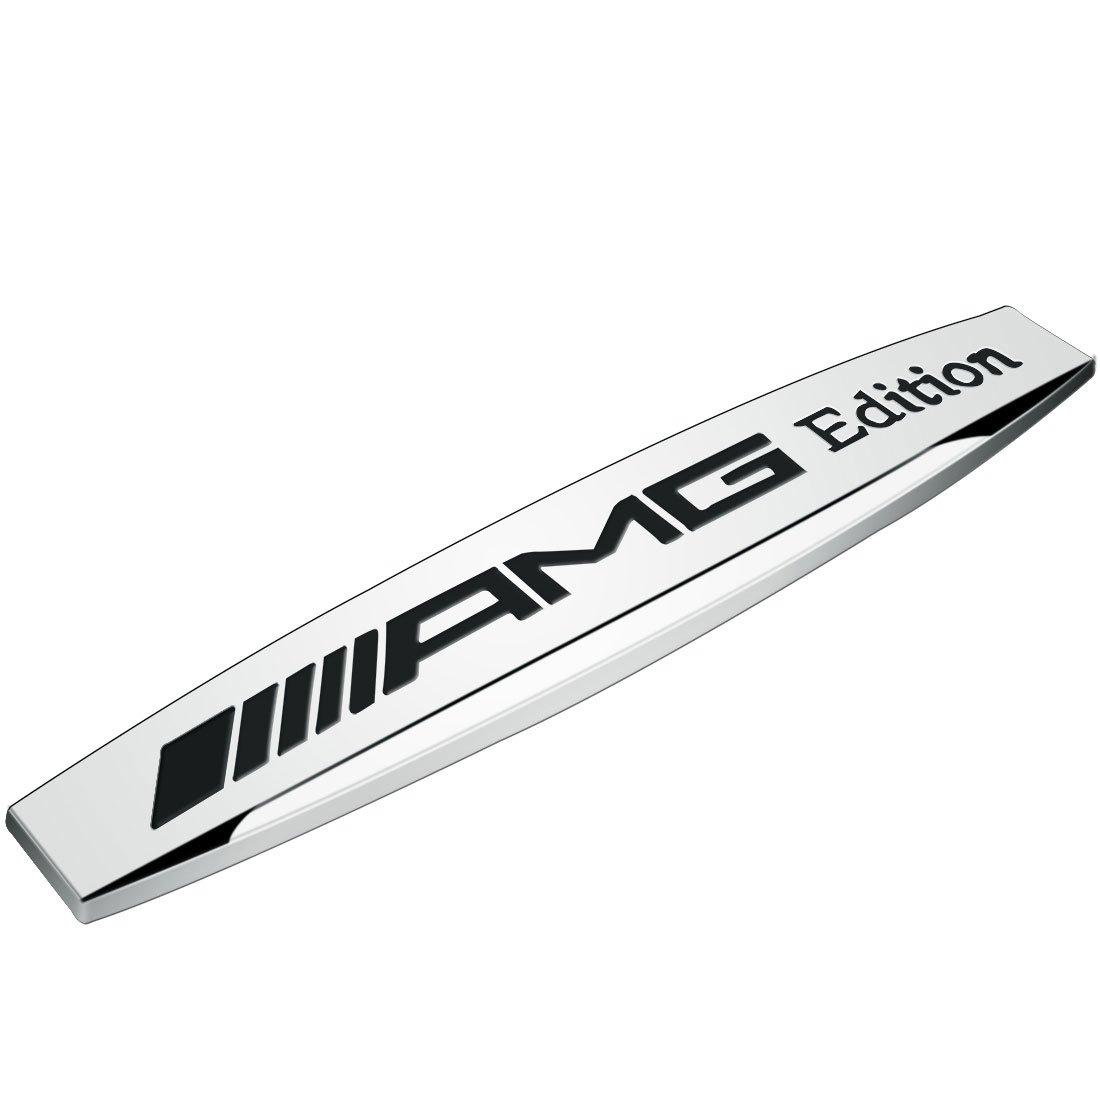 Deselen - LP-BS17 - Car Emblem Chrome Stickers Decals Badge Labeling for Mercedes Benz AMG , 1pc